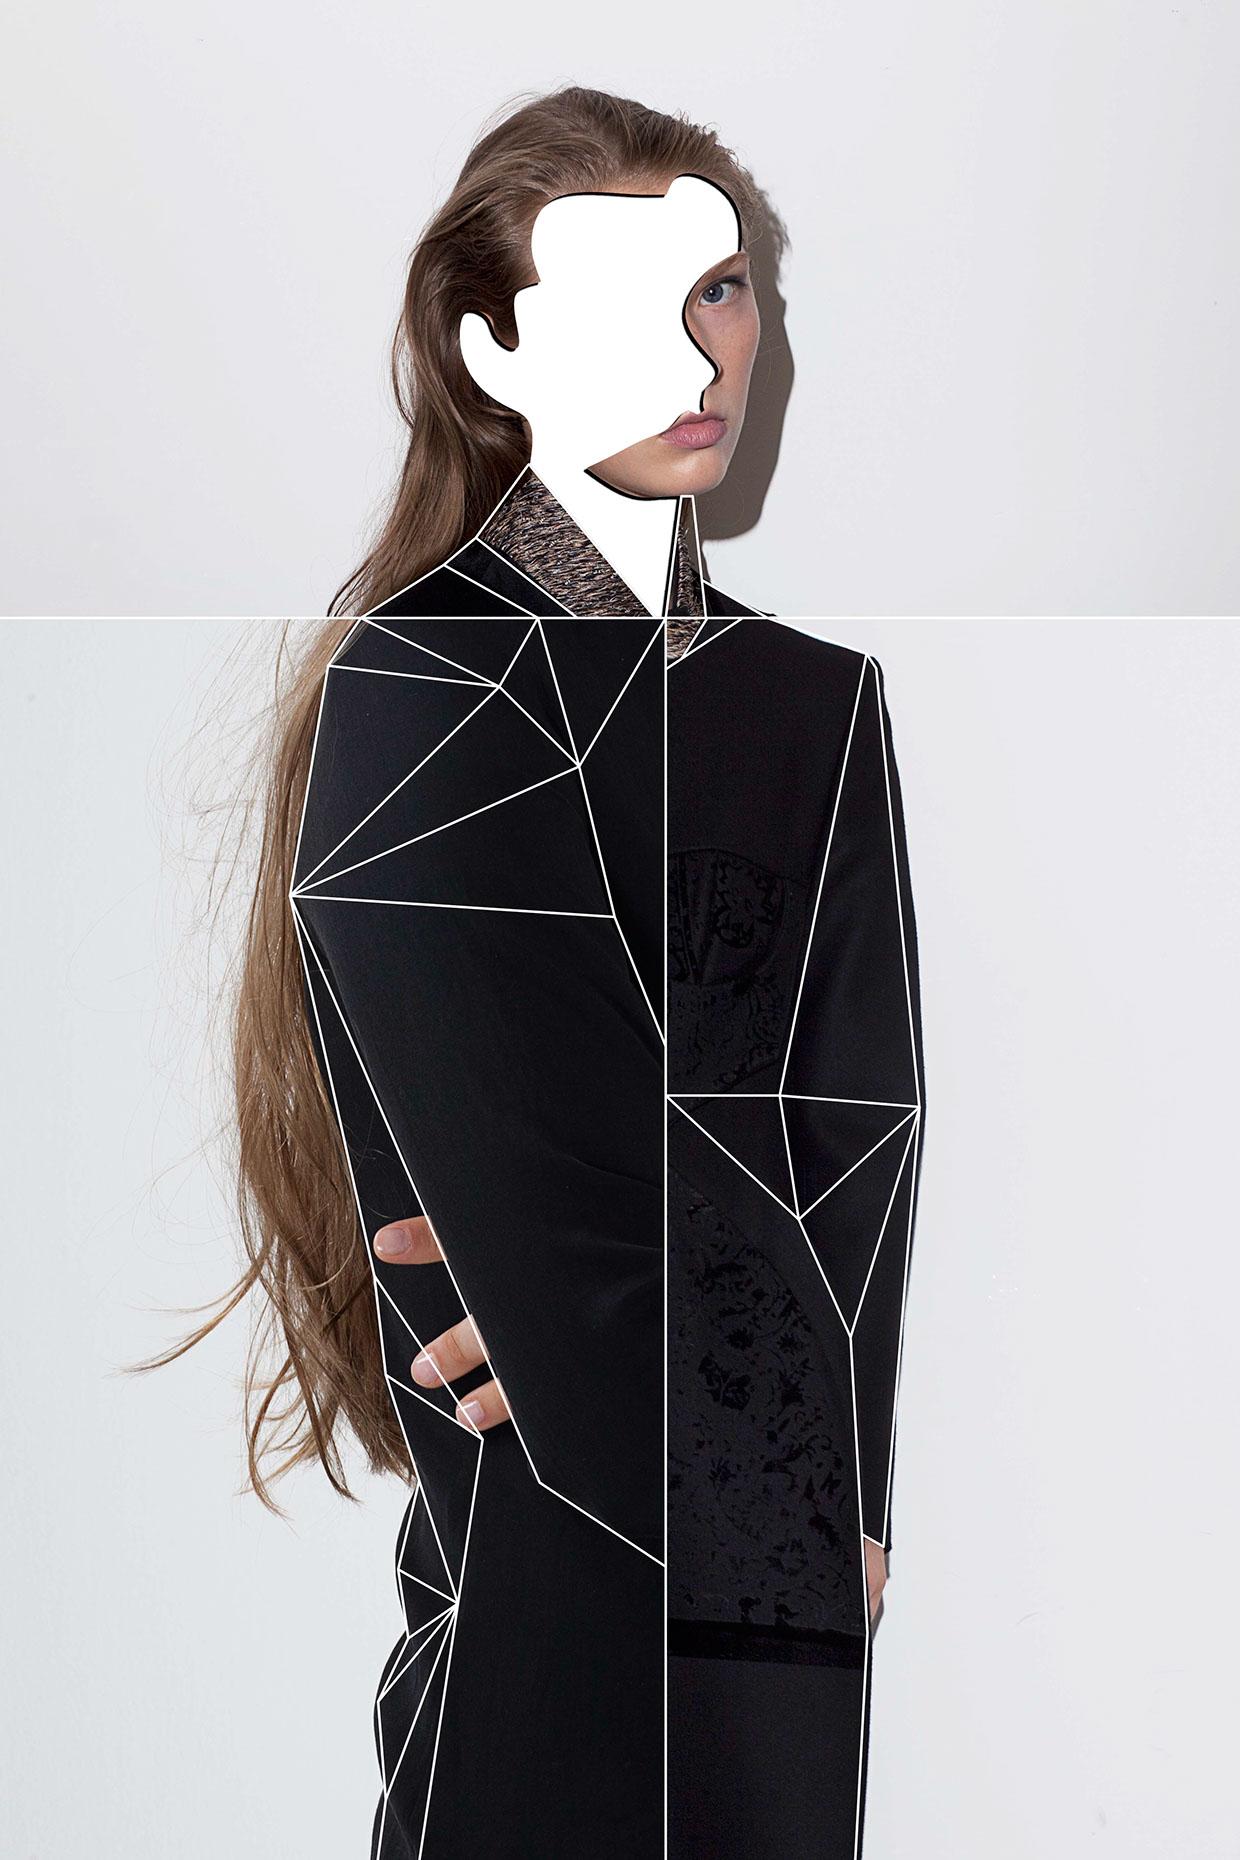 Boris-Peianov-fashion-collage-3 | Trendland